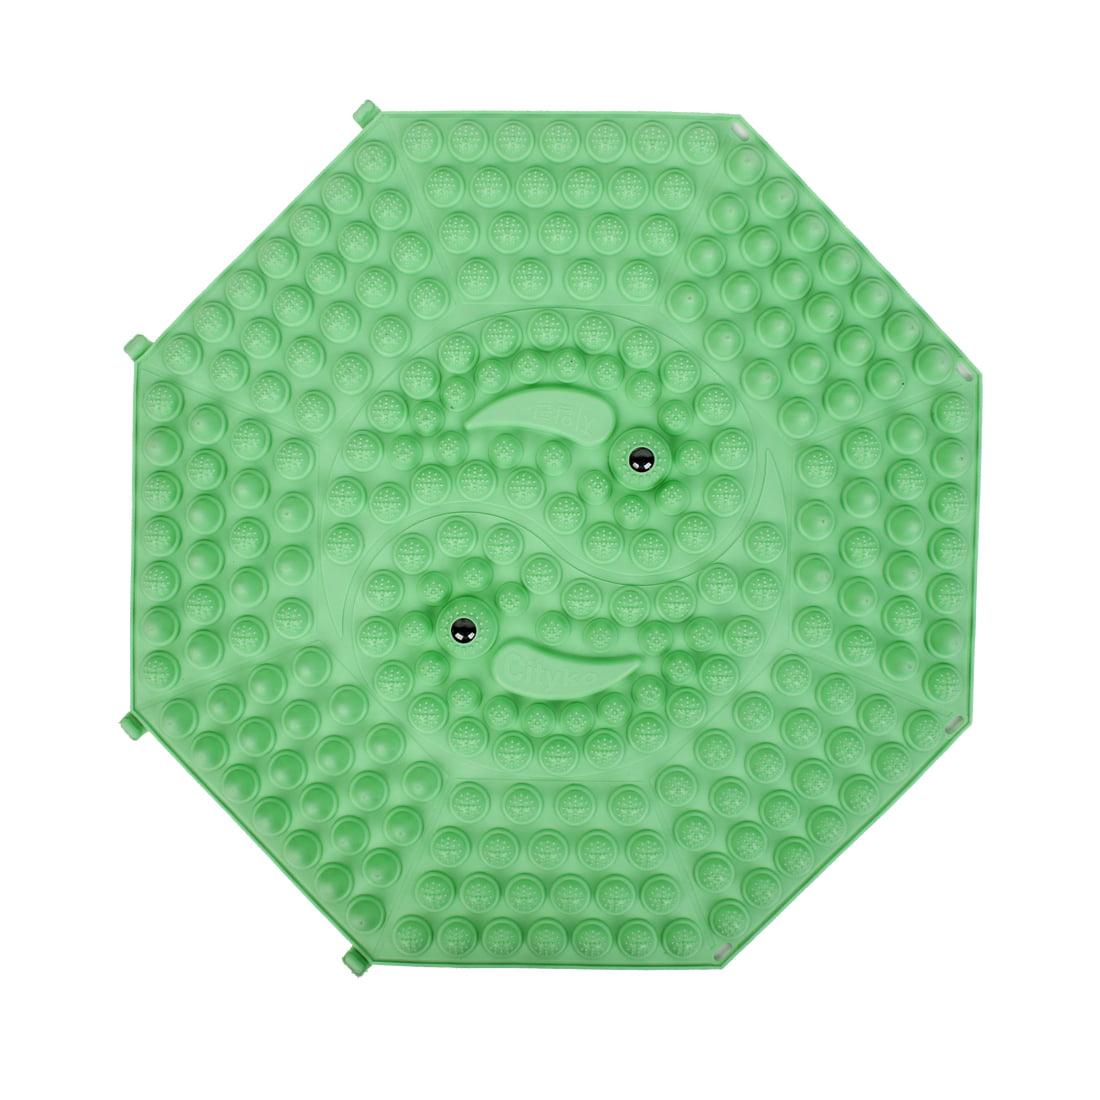 Unique Bargains Exercise Leisure Rubber Octagon Design Foot Acupressure Massage Mat Light Green